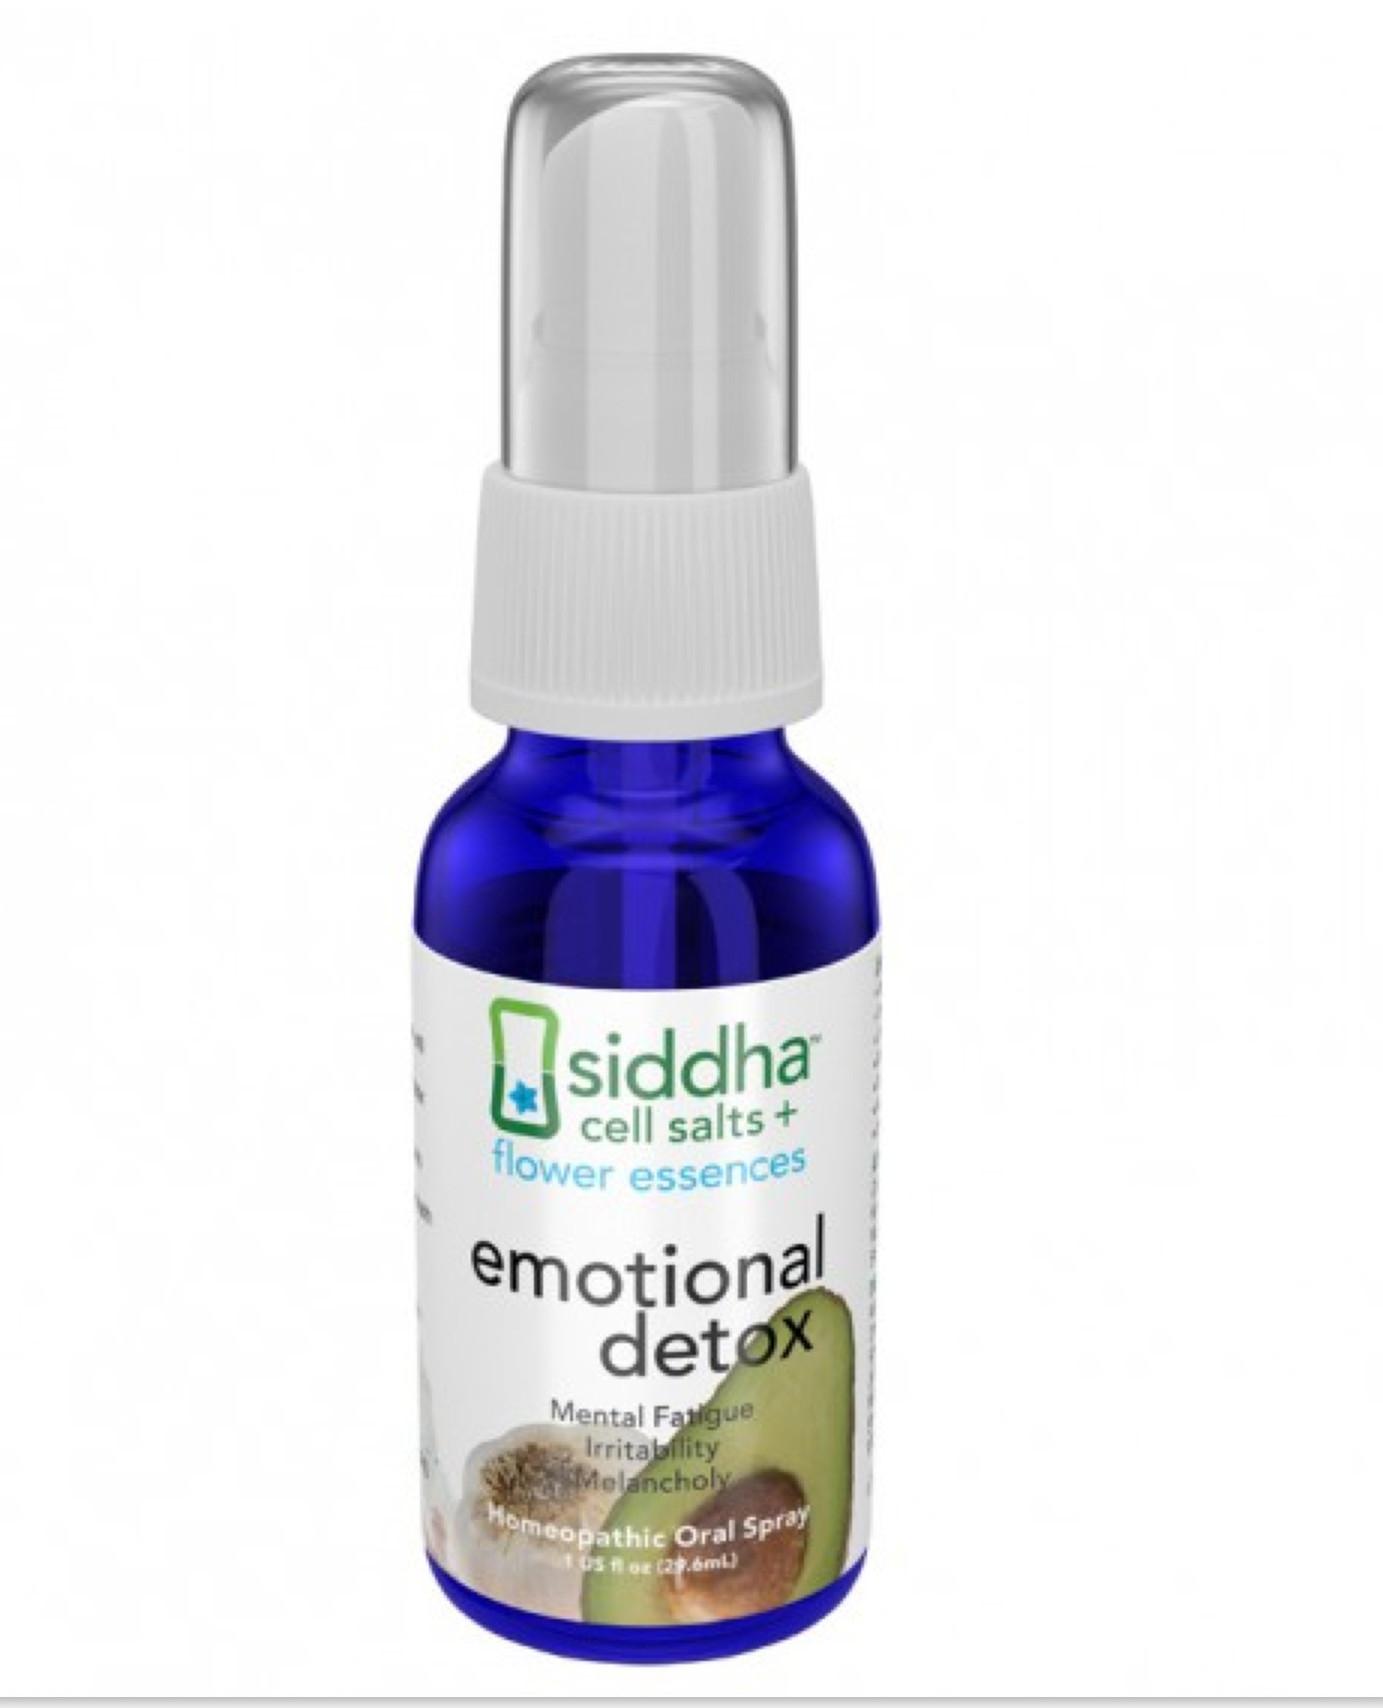 Emotional Detox  siddha flower essences